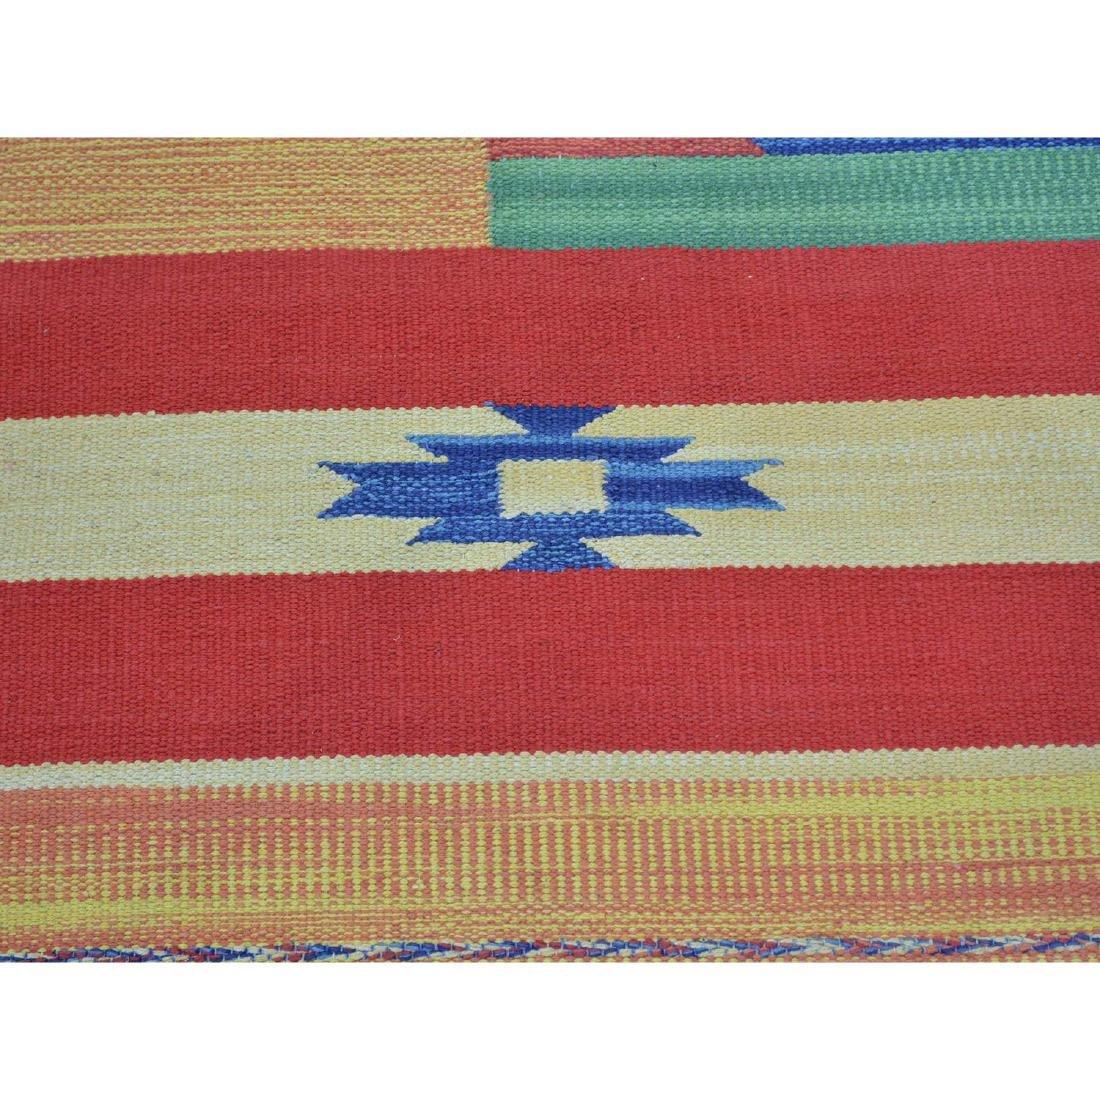 Flat Weave Kilim Hand Woven Navajo Design Rug 6x6.1 - 4